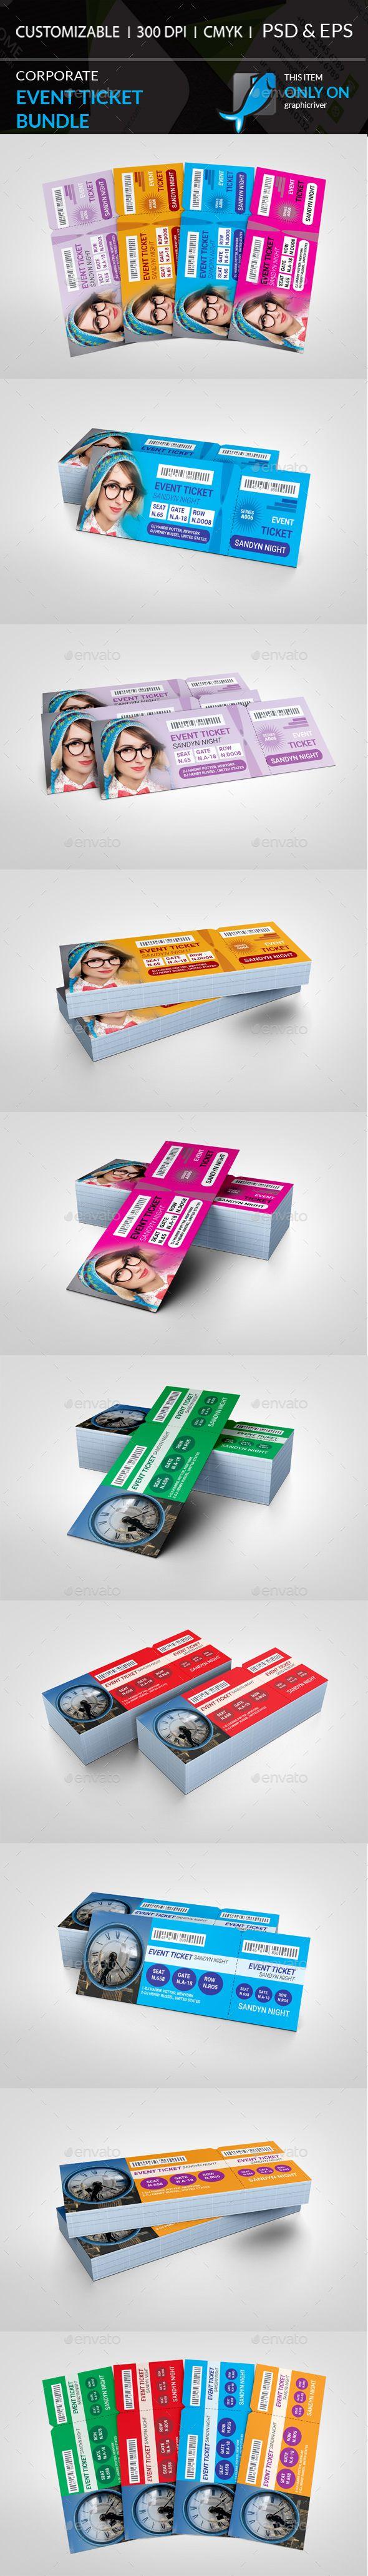 Event Ticket Bundle VIP Pass Cards & Invites Print Templates